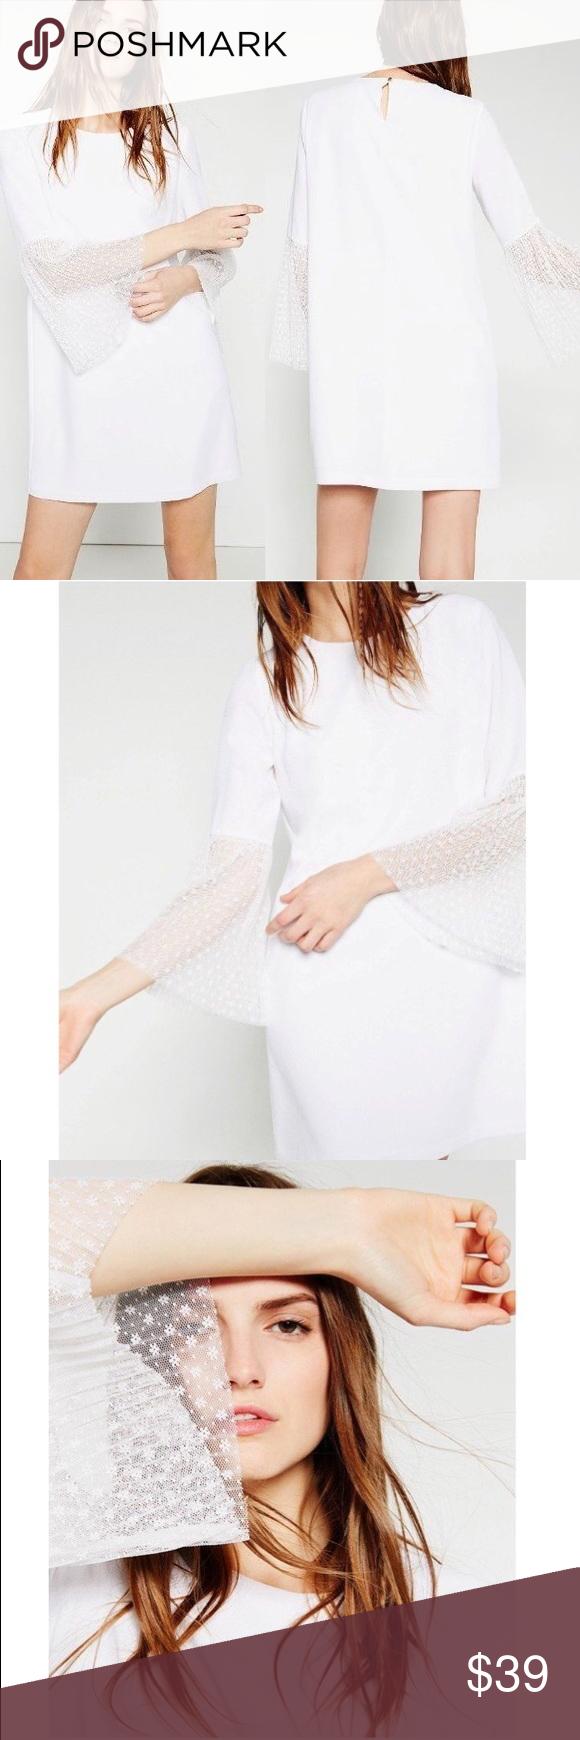 White lace dress zara  ZARA Lace Bell Trumpet Sleeve Shift Dress  My Posh Picks  Pinterest